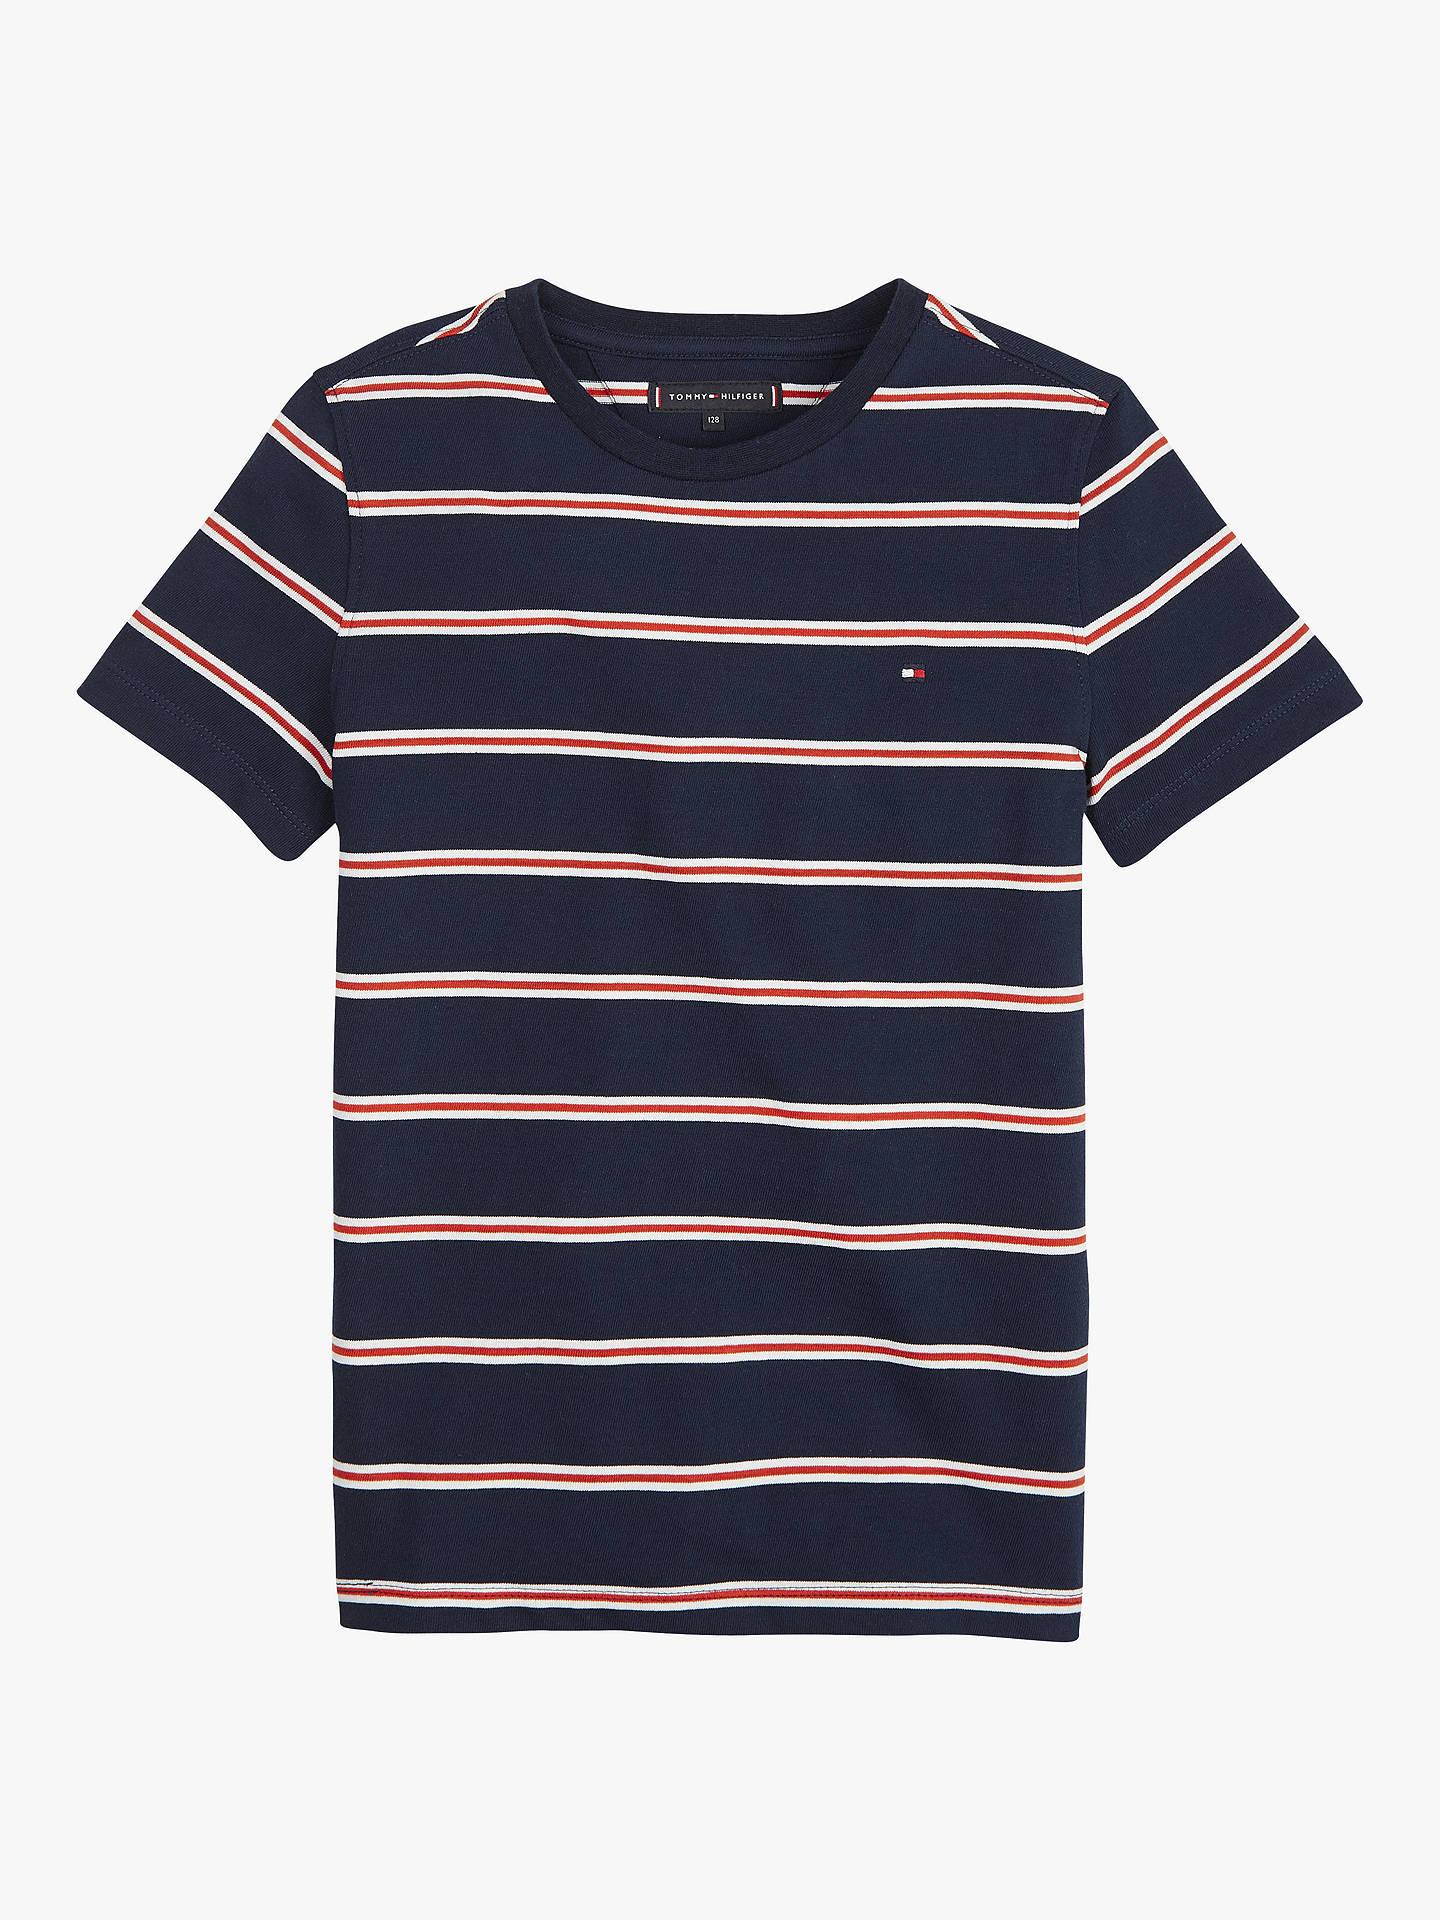 b805e641a Buy Tommy Hilfiger Boys  Stripe Short Sleeve T-Shirt